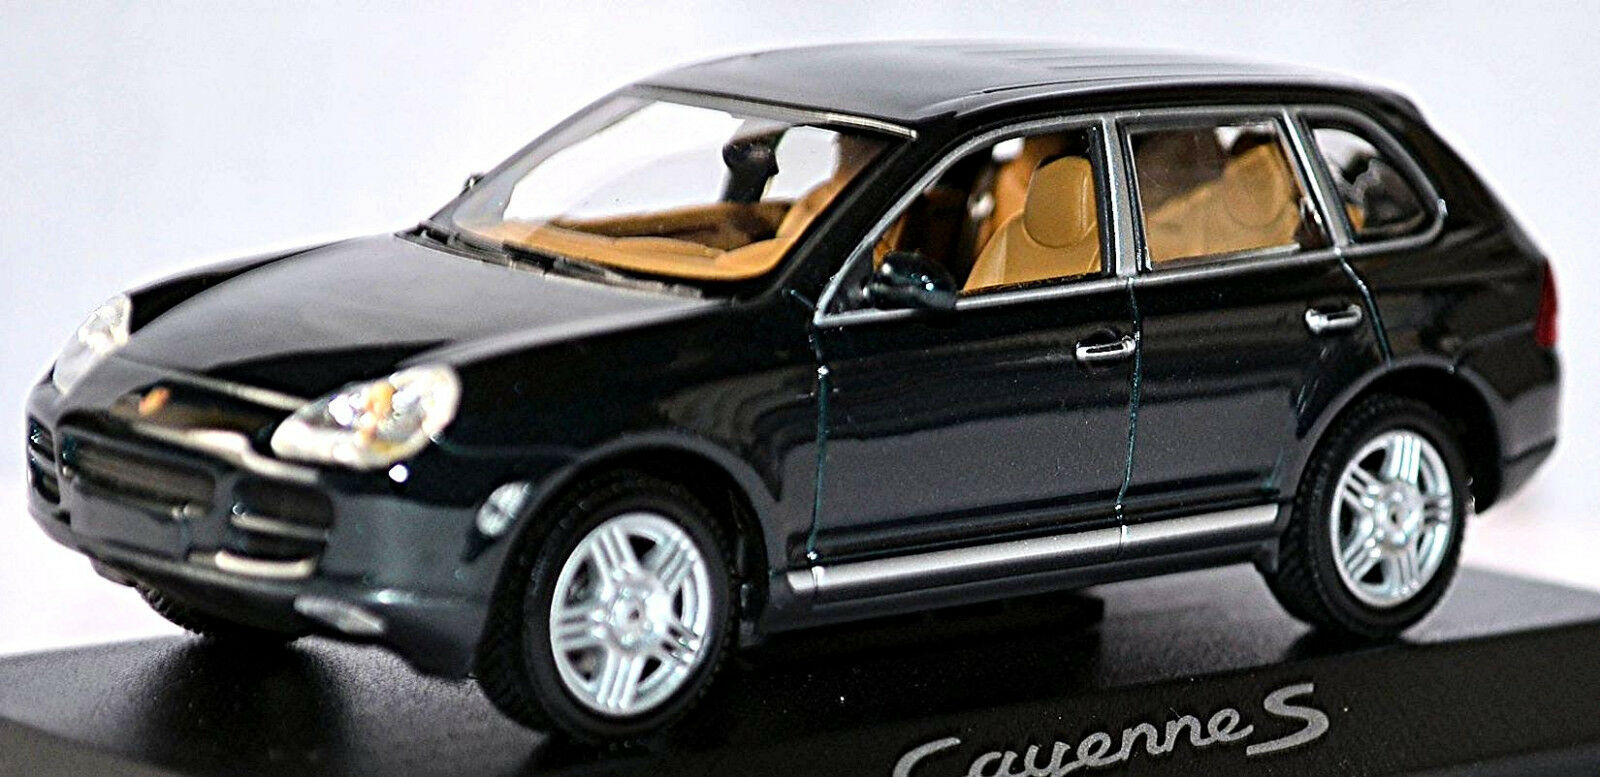 Porsche Cayenne S Type 9 PA 2002-07 lagovert vert Metallic 1 43 Minichamps